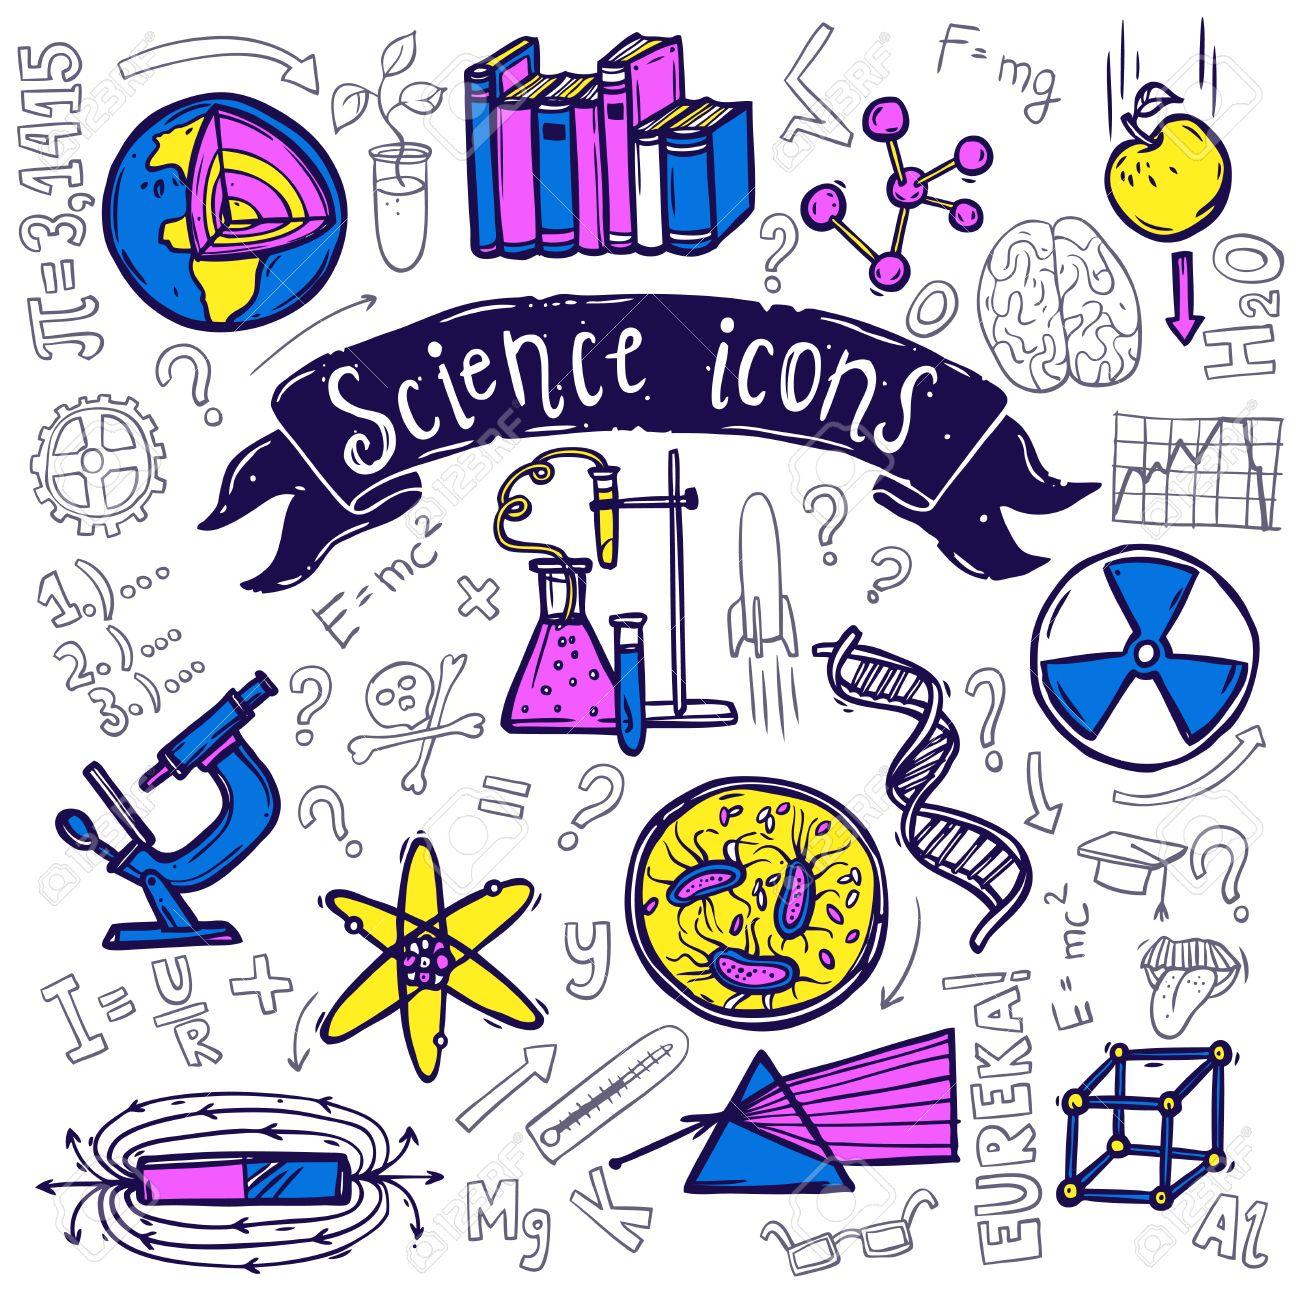 Science Symbols Doodle Sketch Pictograms Of Relativity Equation